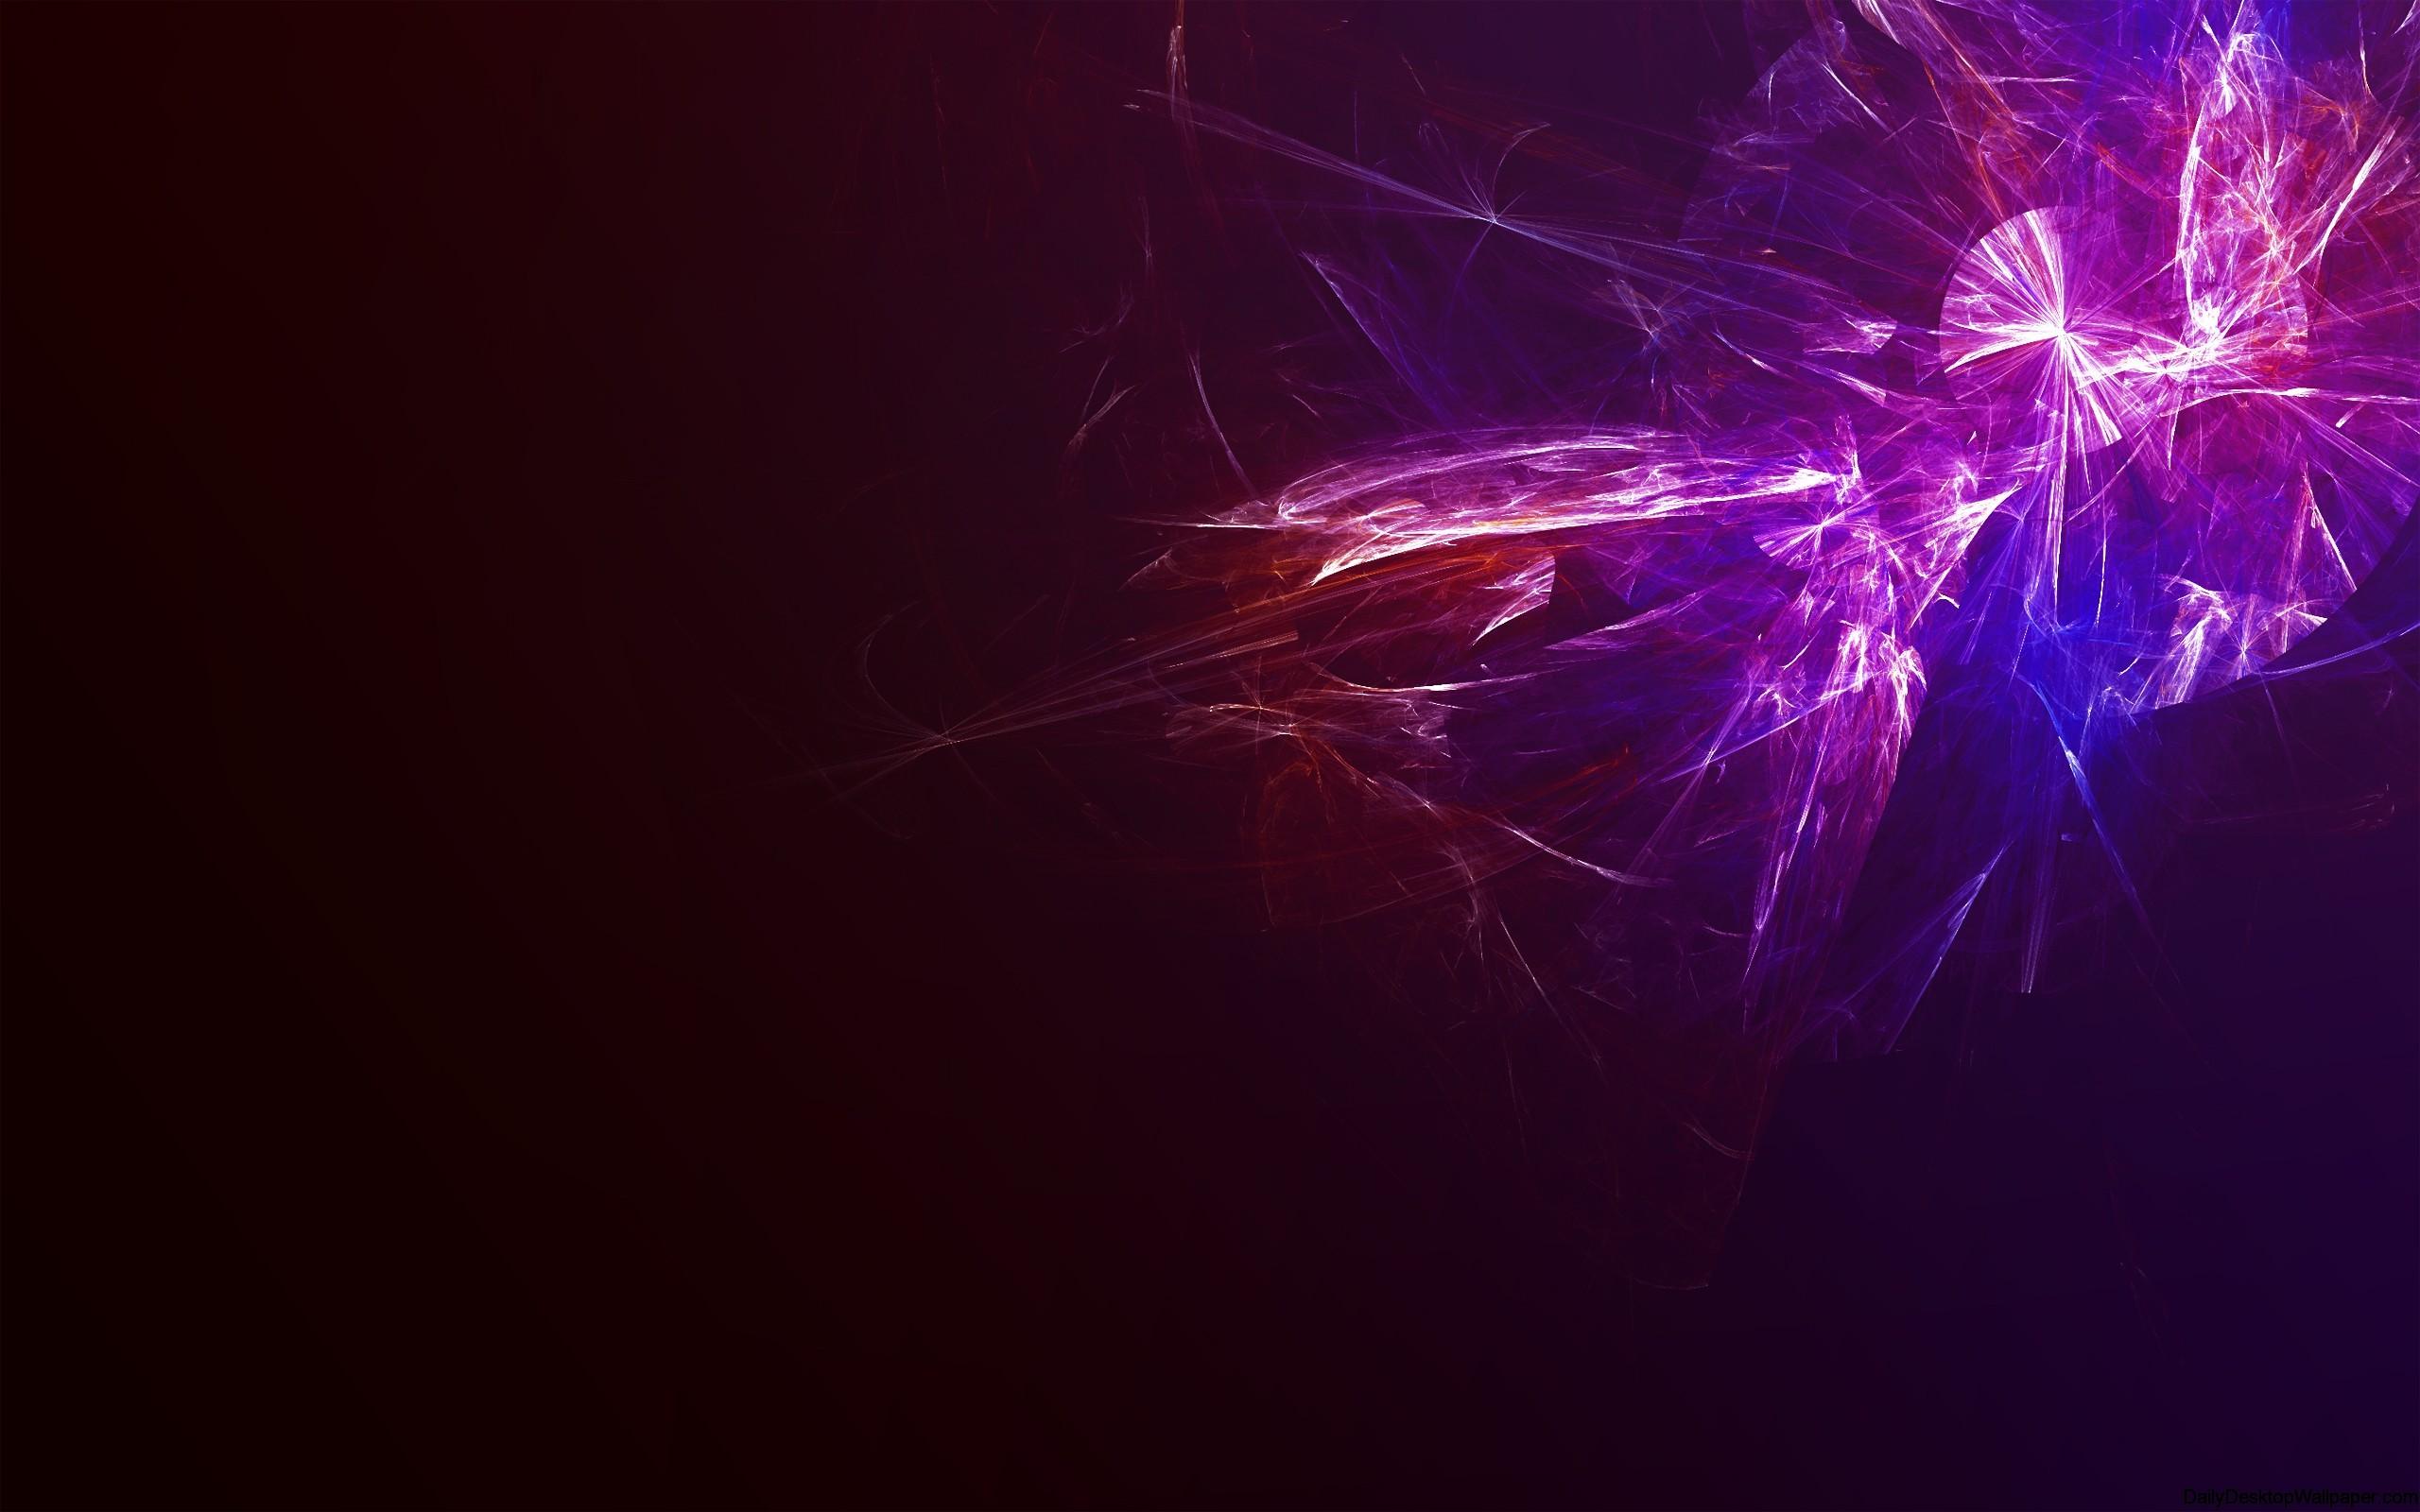 Cellophane Purple